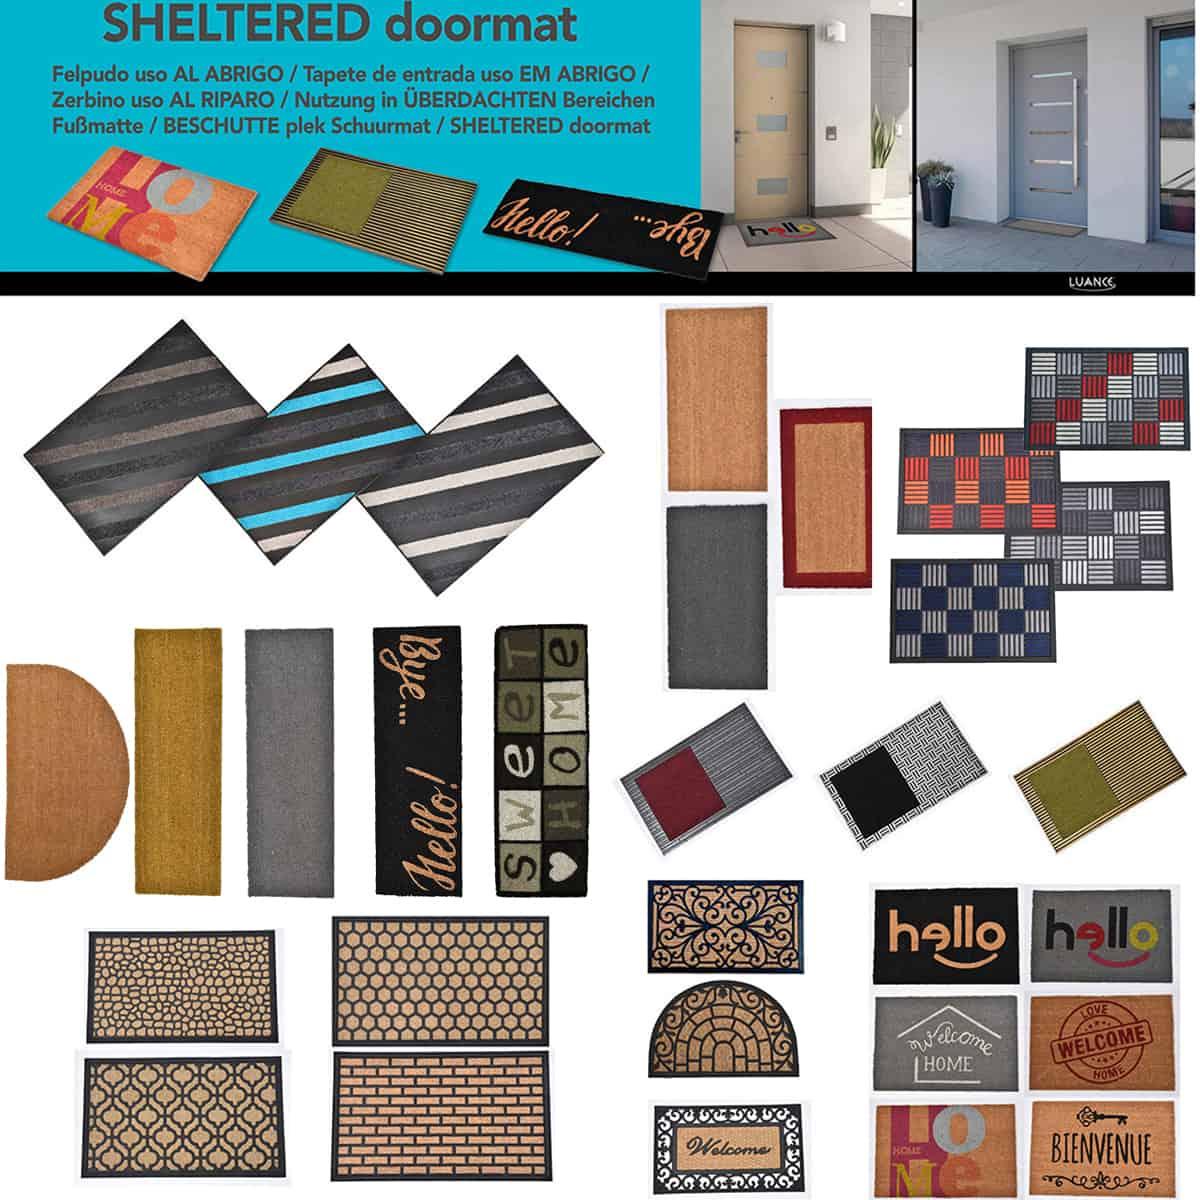 Sheltered Long Front Door Mat Coir Coco Fibers Rug 30x10 Natural